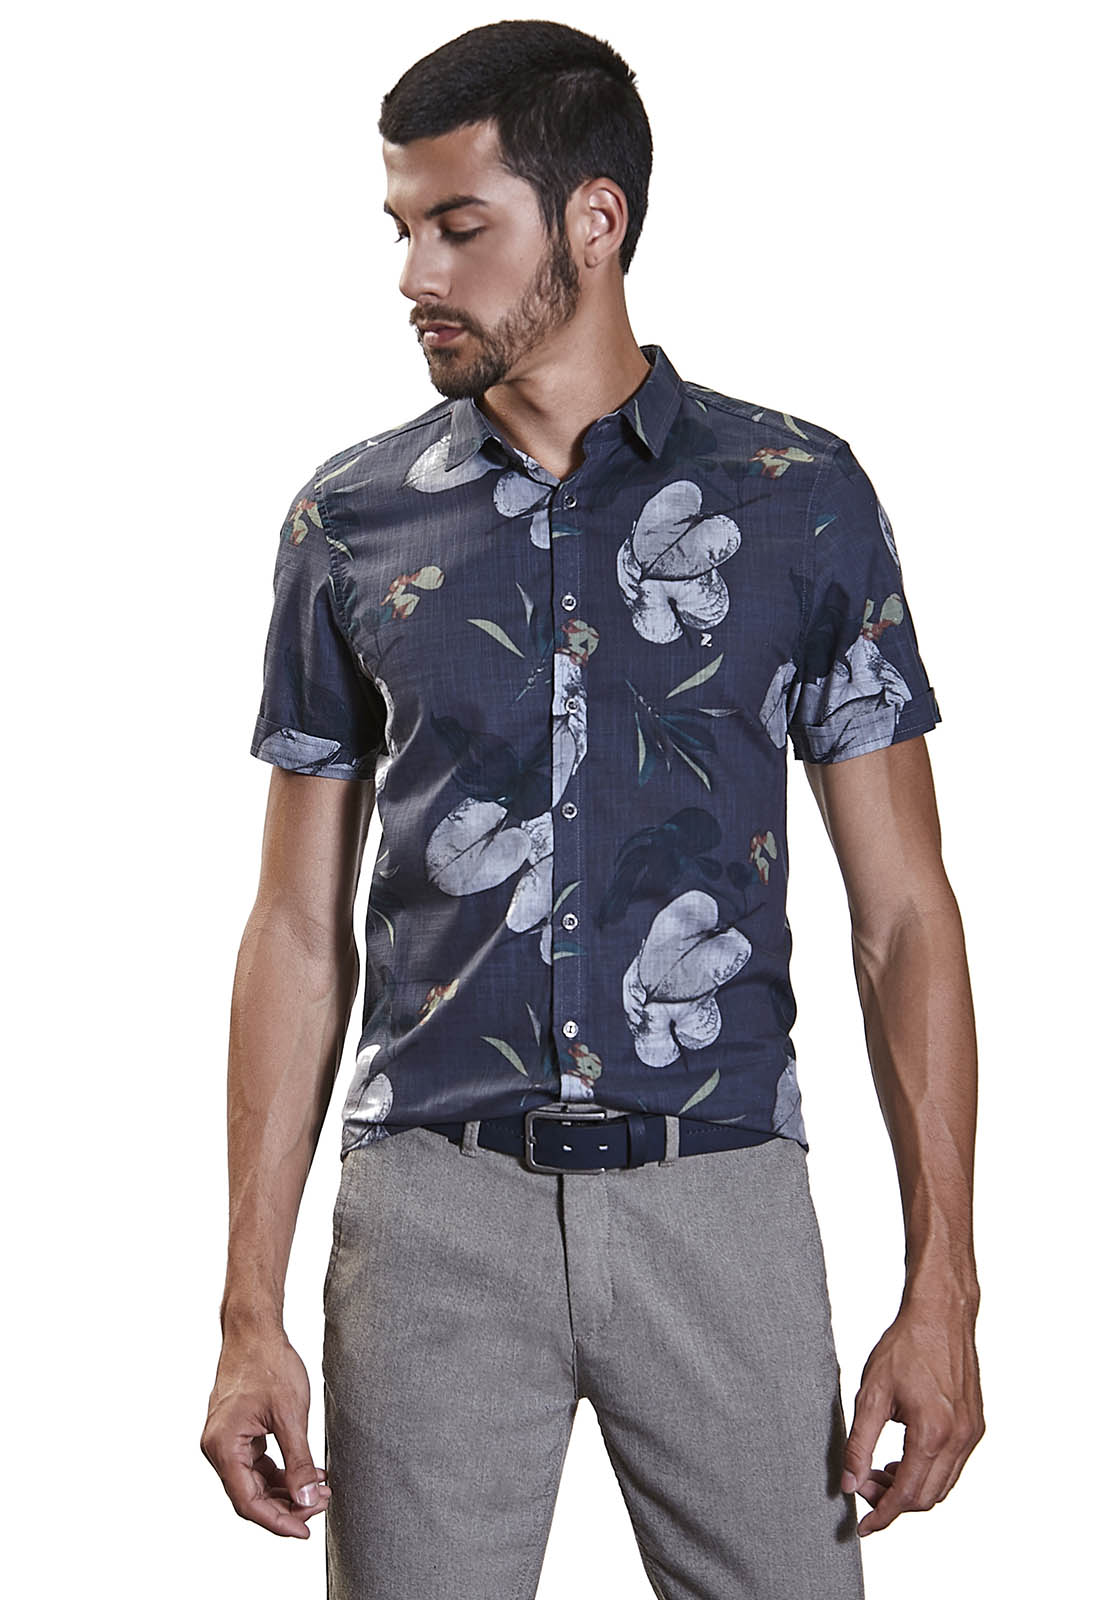 Camisa Slim Zaiko Estampada Floral Manga Curta 2259 Marinho